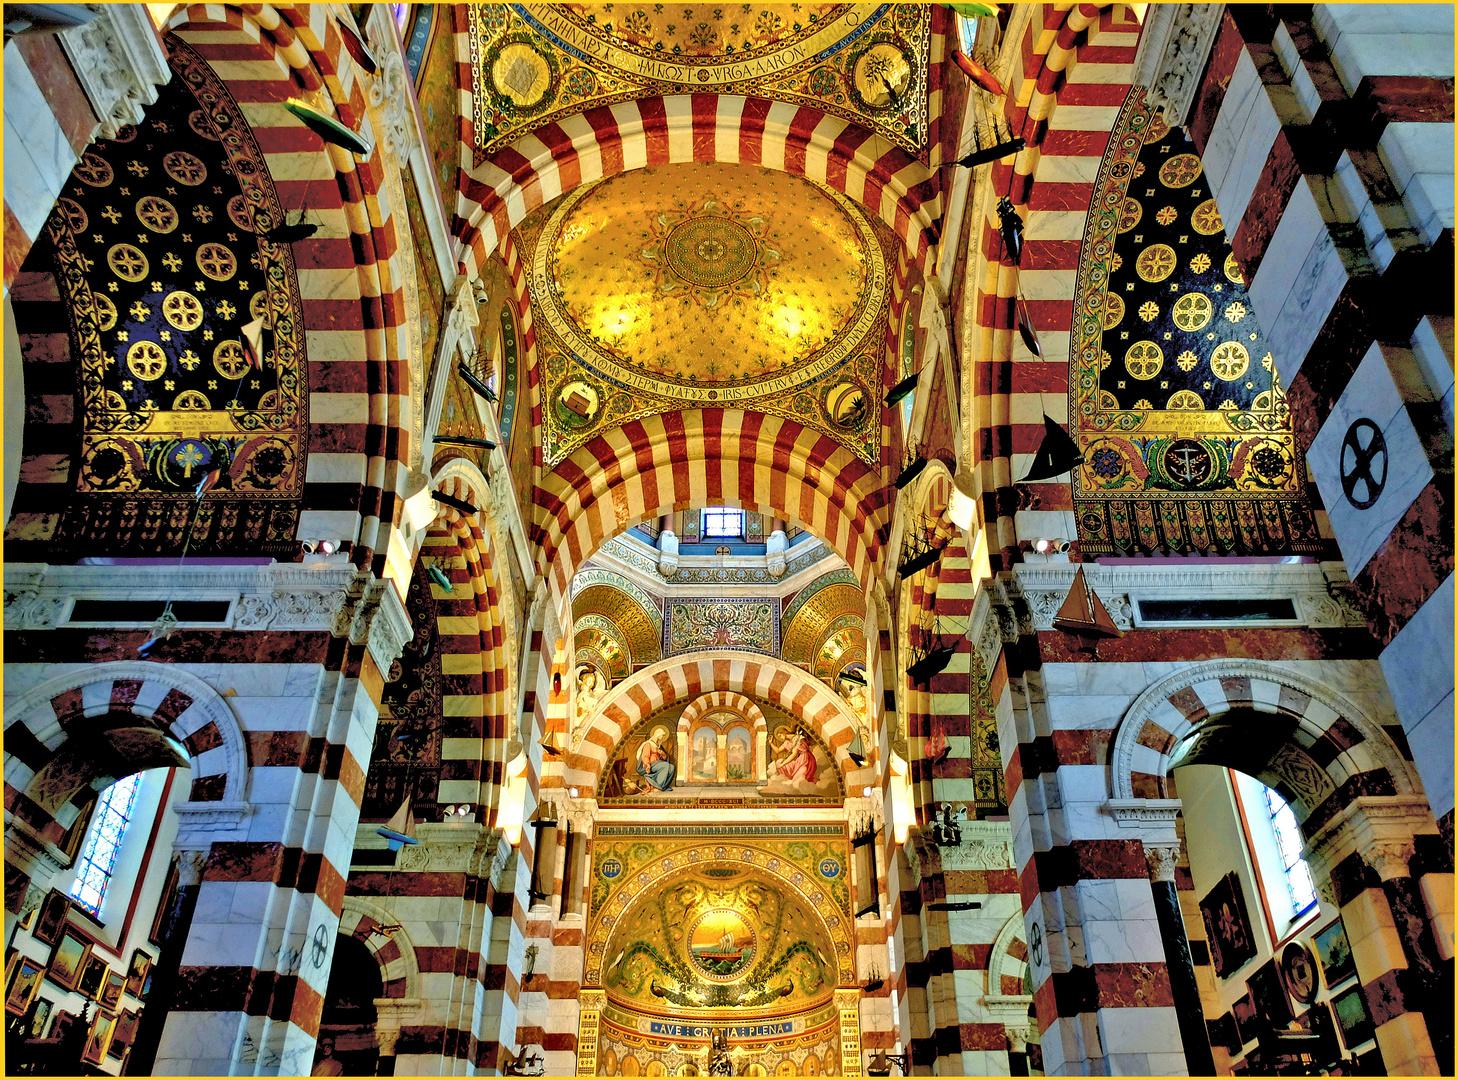 L'or de Byzance